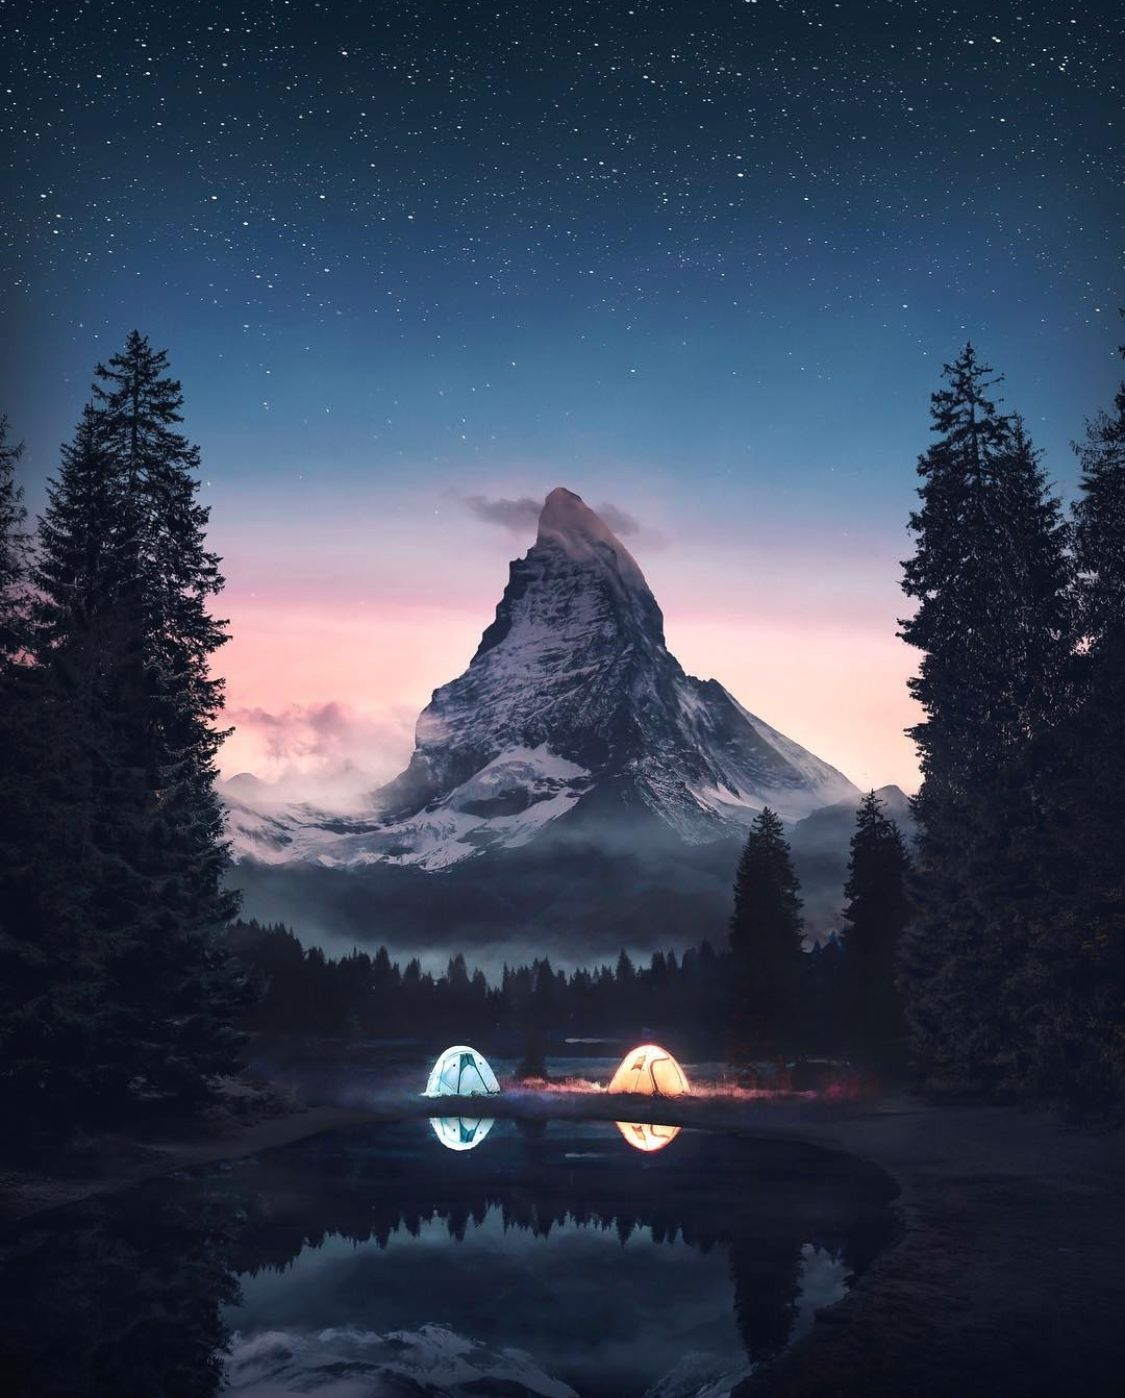 Pin by 𝚓 𝚊 𝚜 𝚖 𝚒 𝚗 𝚎 on wanderlust | Travel, Beautiful ...